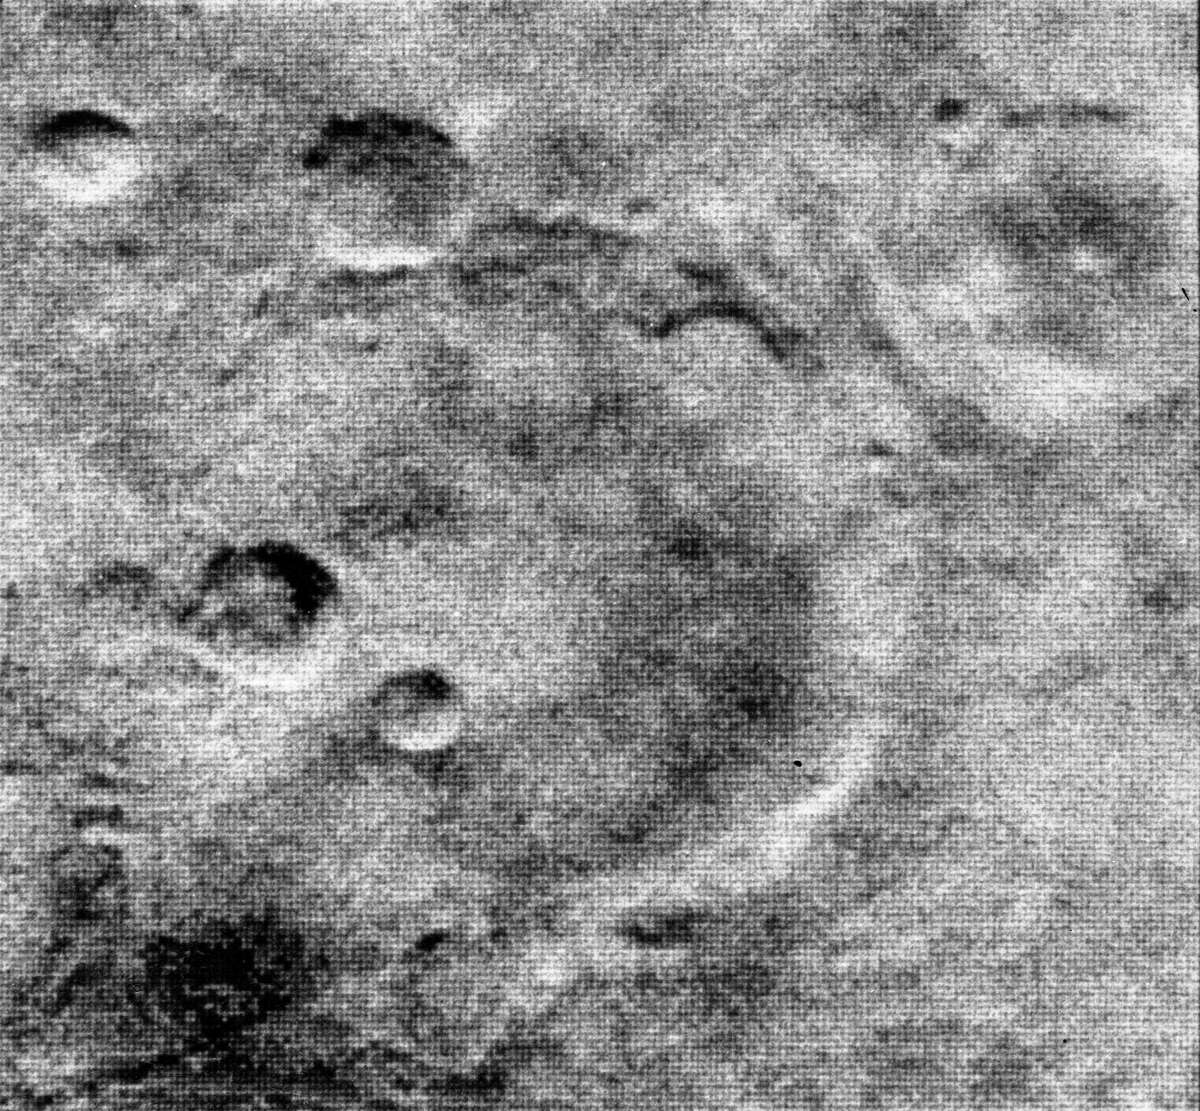 Mars Date: July 15, 1965 Spacecraft: Mariner 4